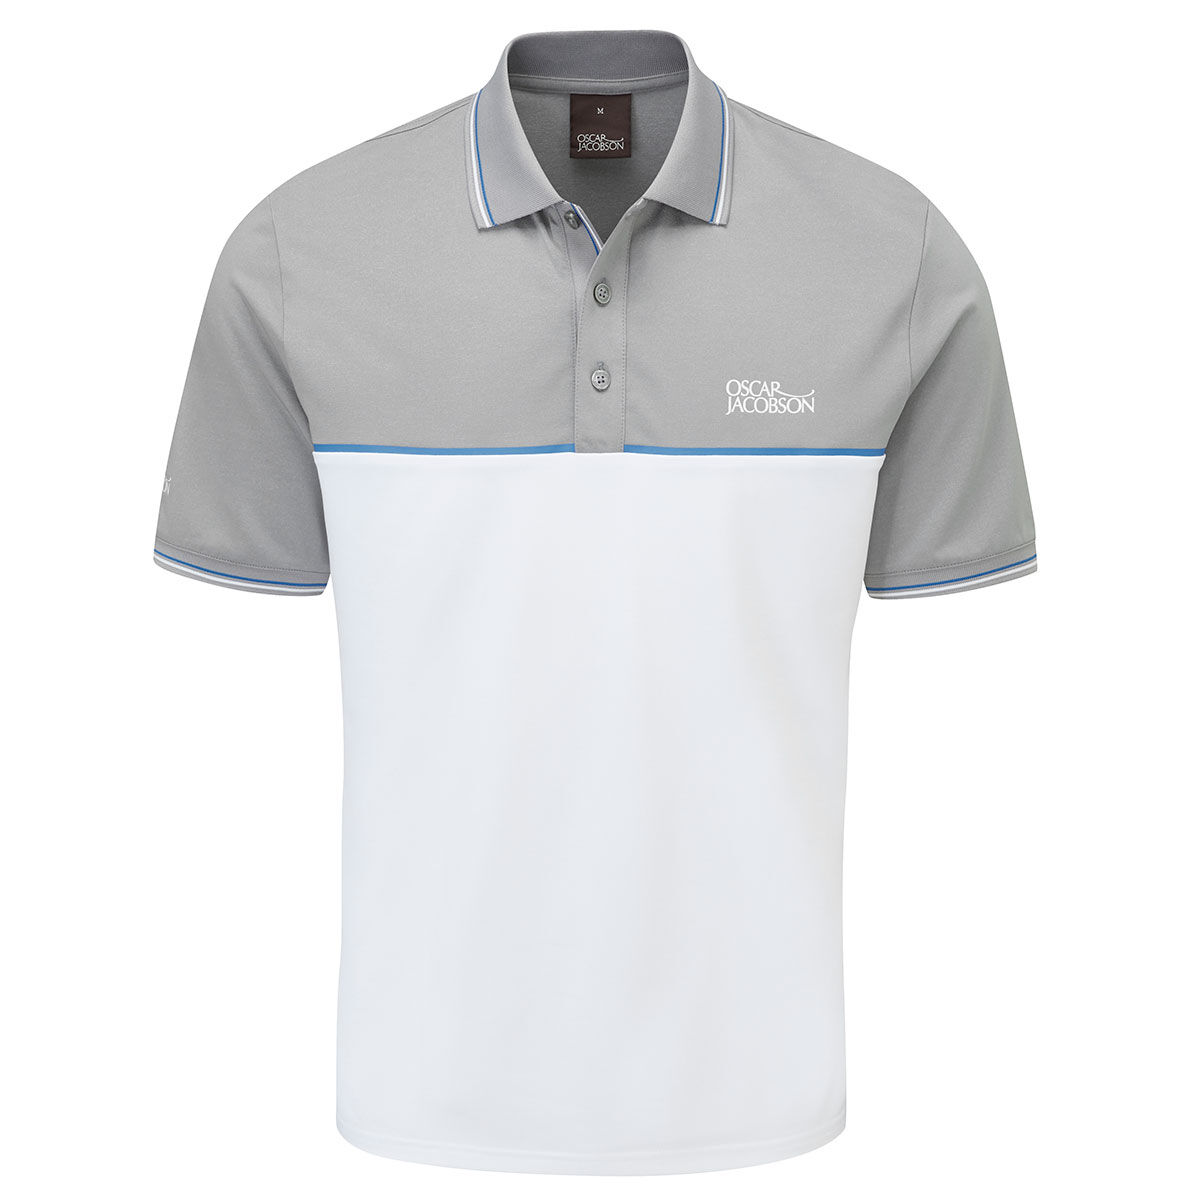 Oscar Jacobson Belford Golf Polo Shirt, Mens, Small, Light grey marl | American Golf